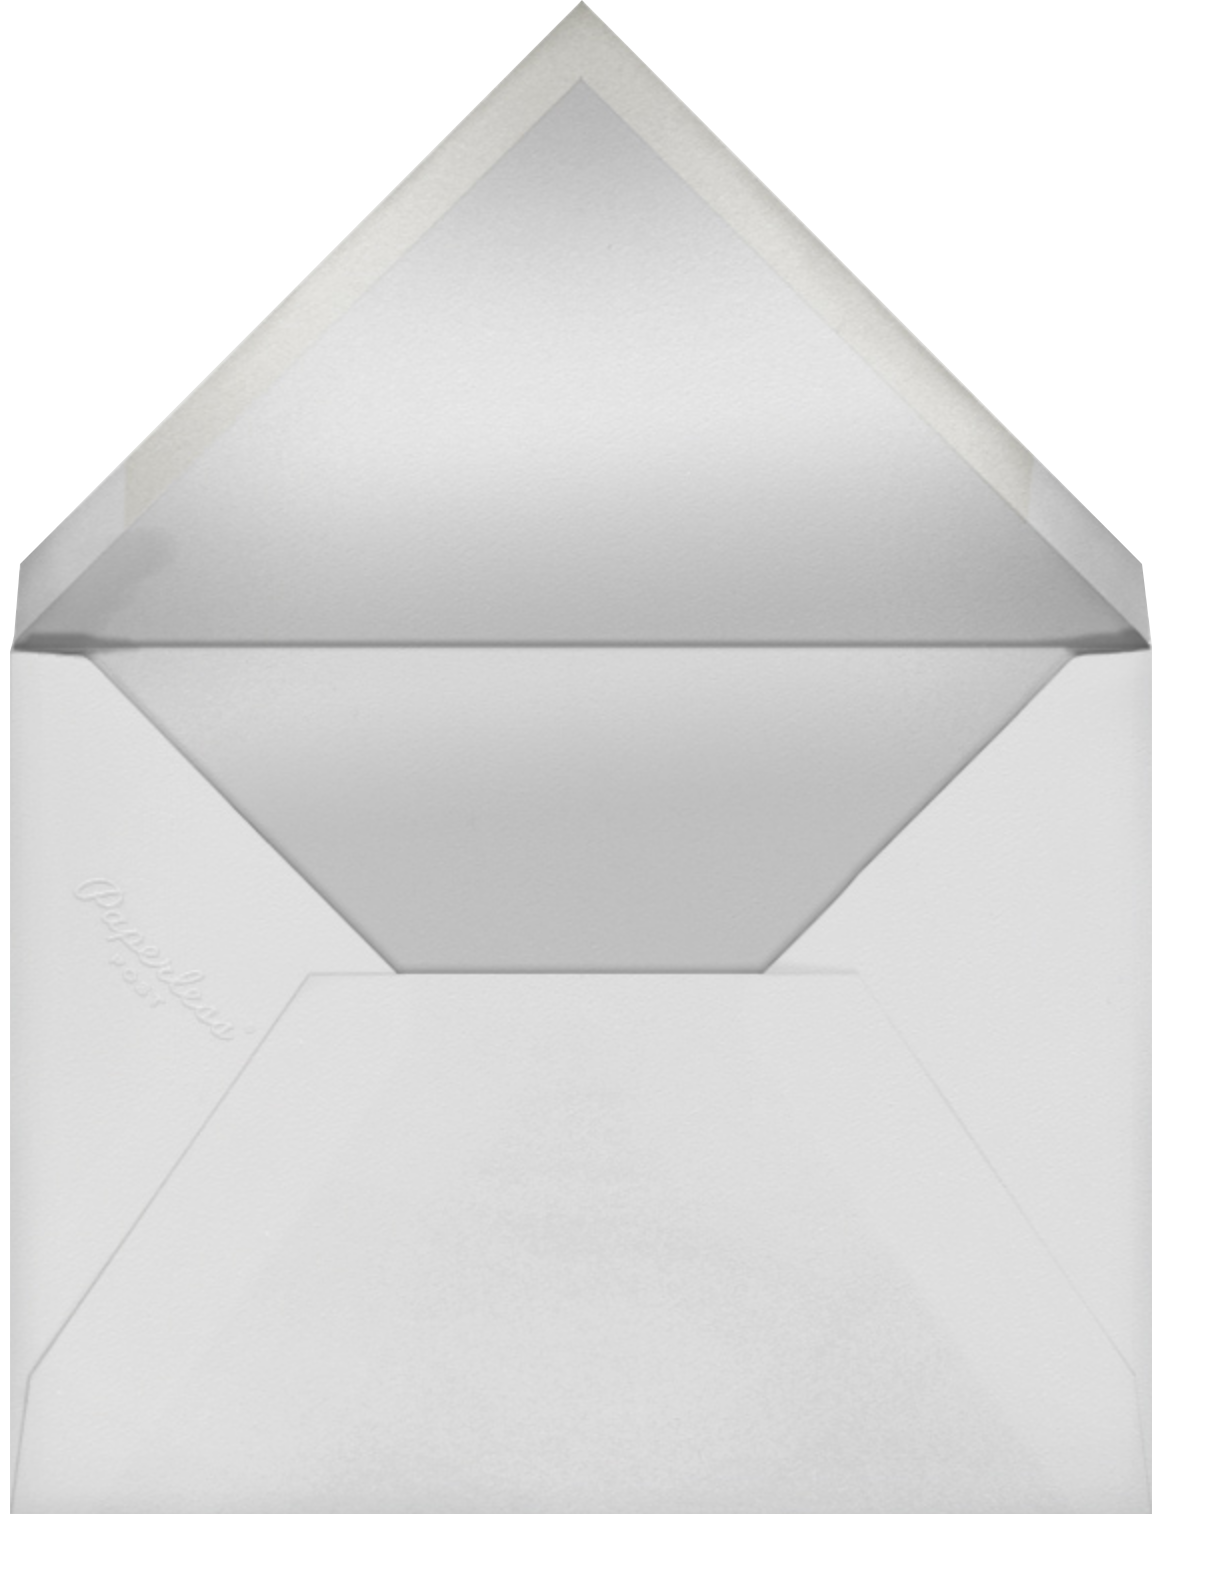 March Herbarium (Program) - Rifle Paper Co. - Menus and programs - envelope back